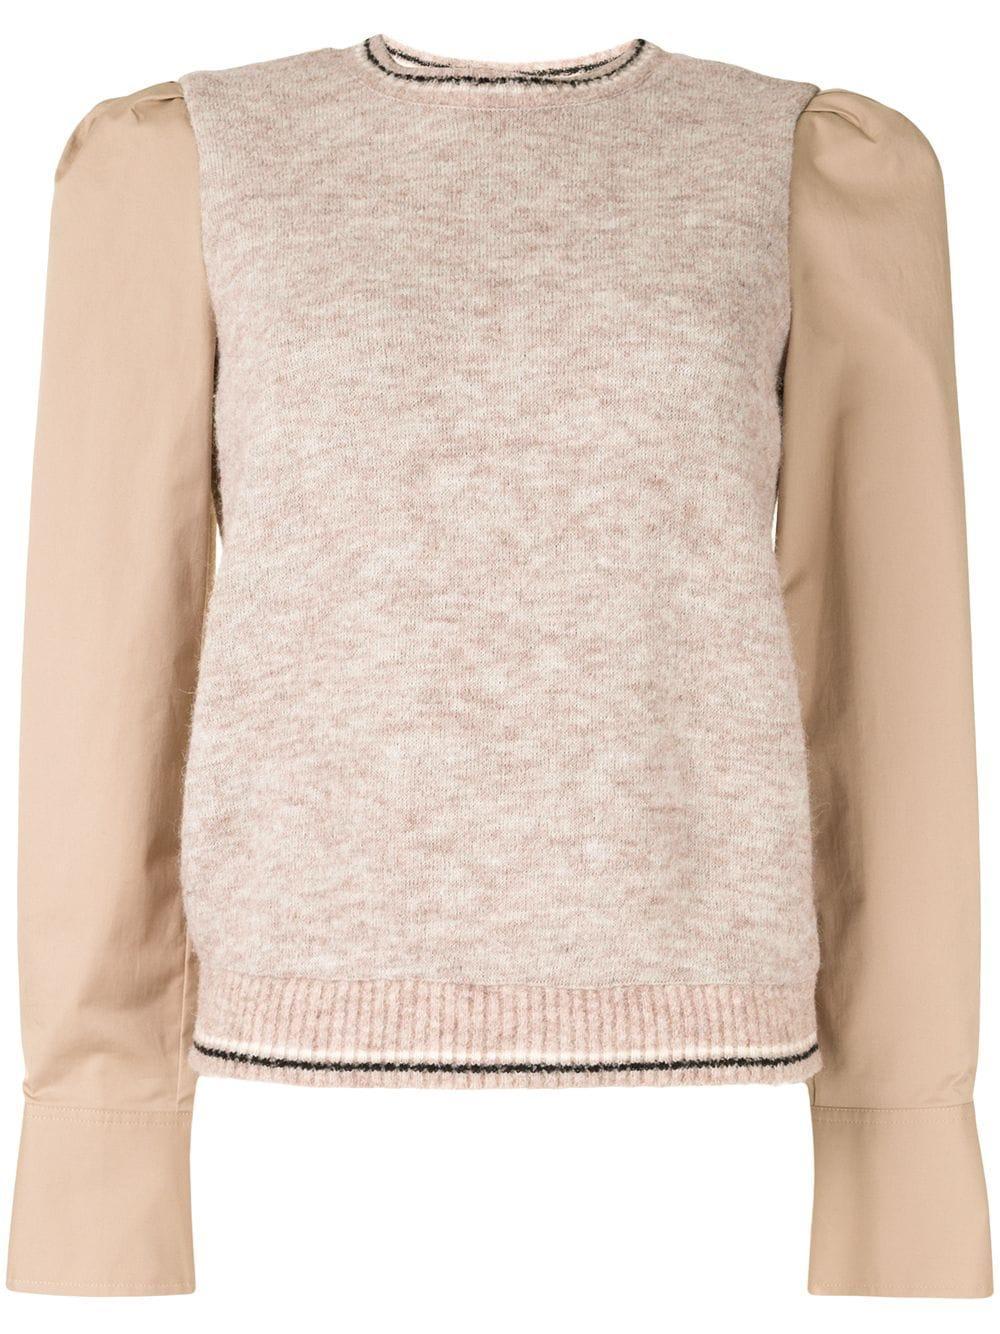 Milton Mixed Media Sweater